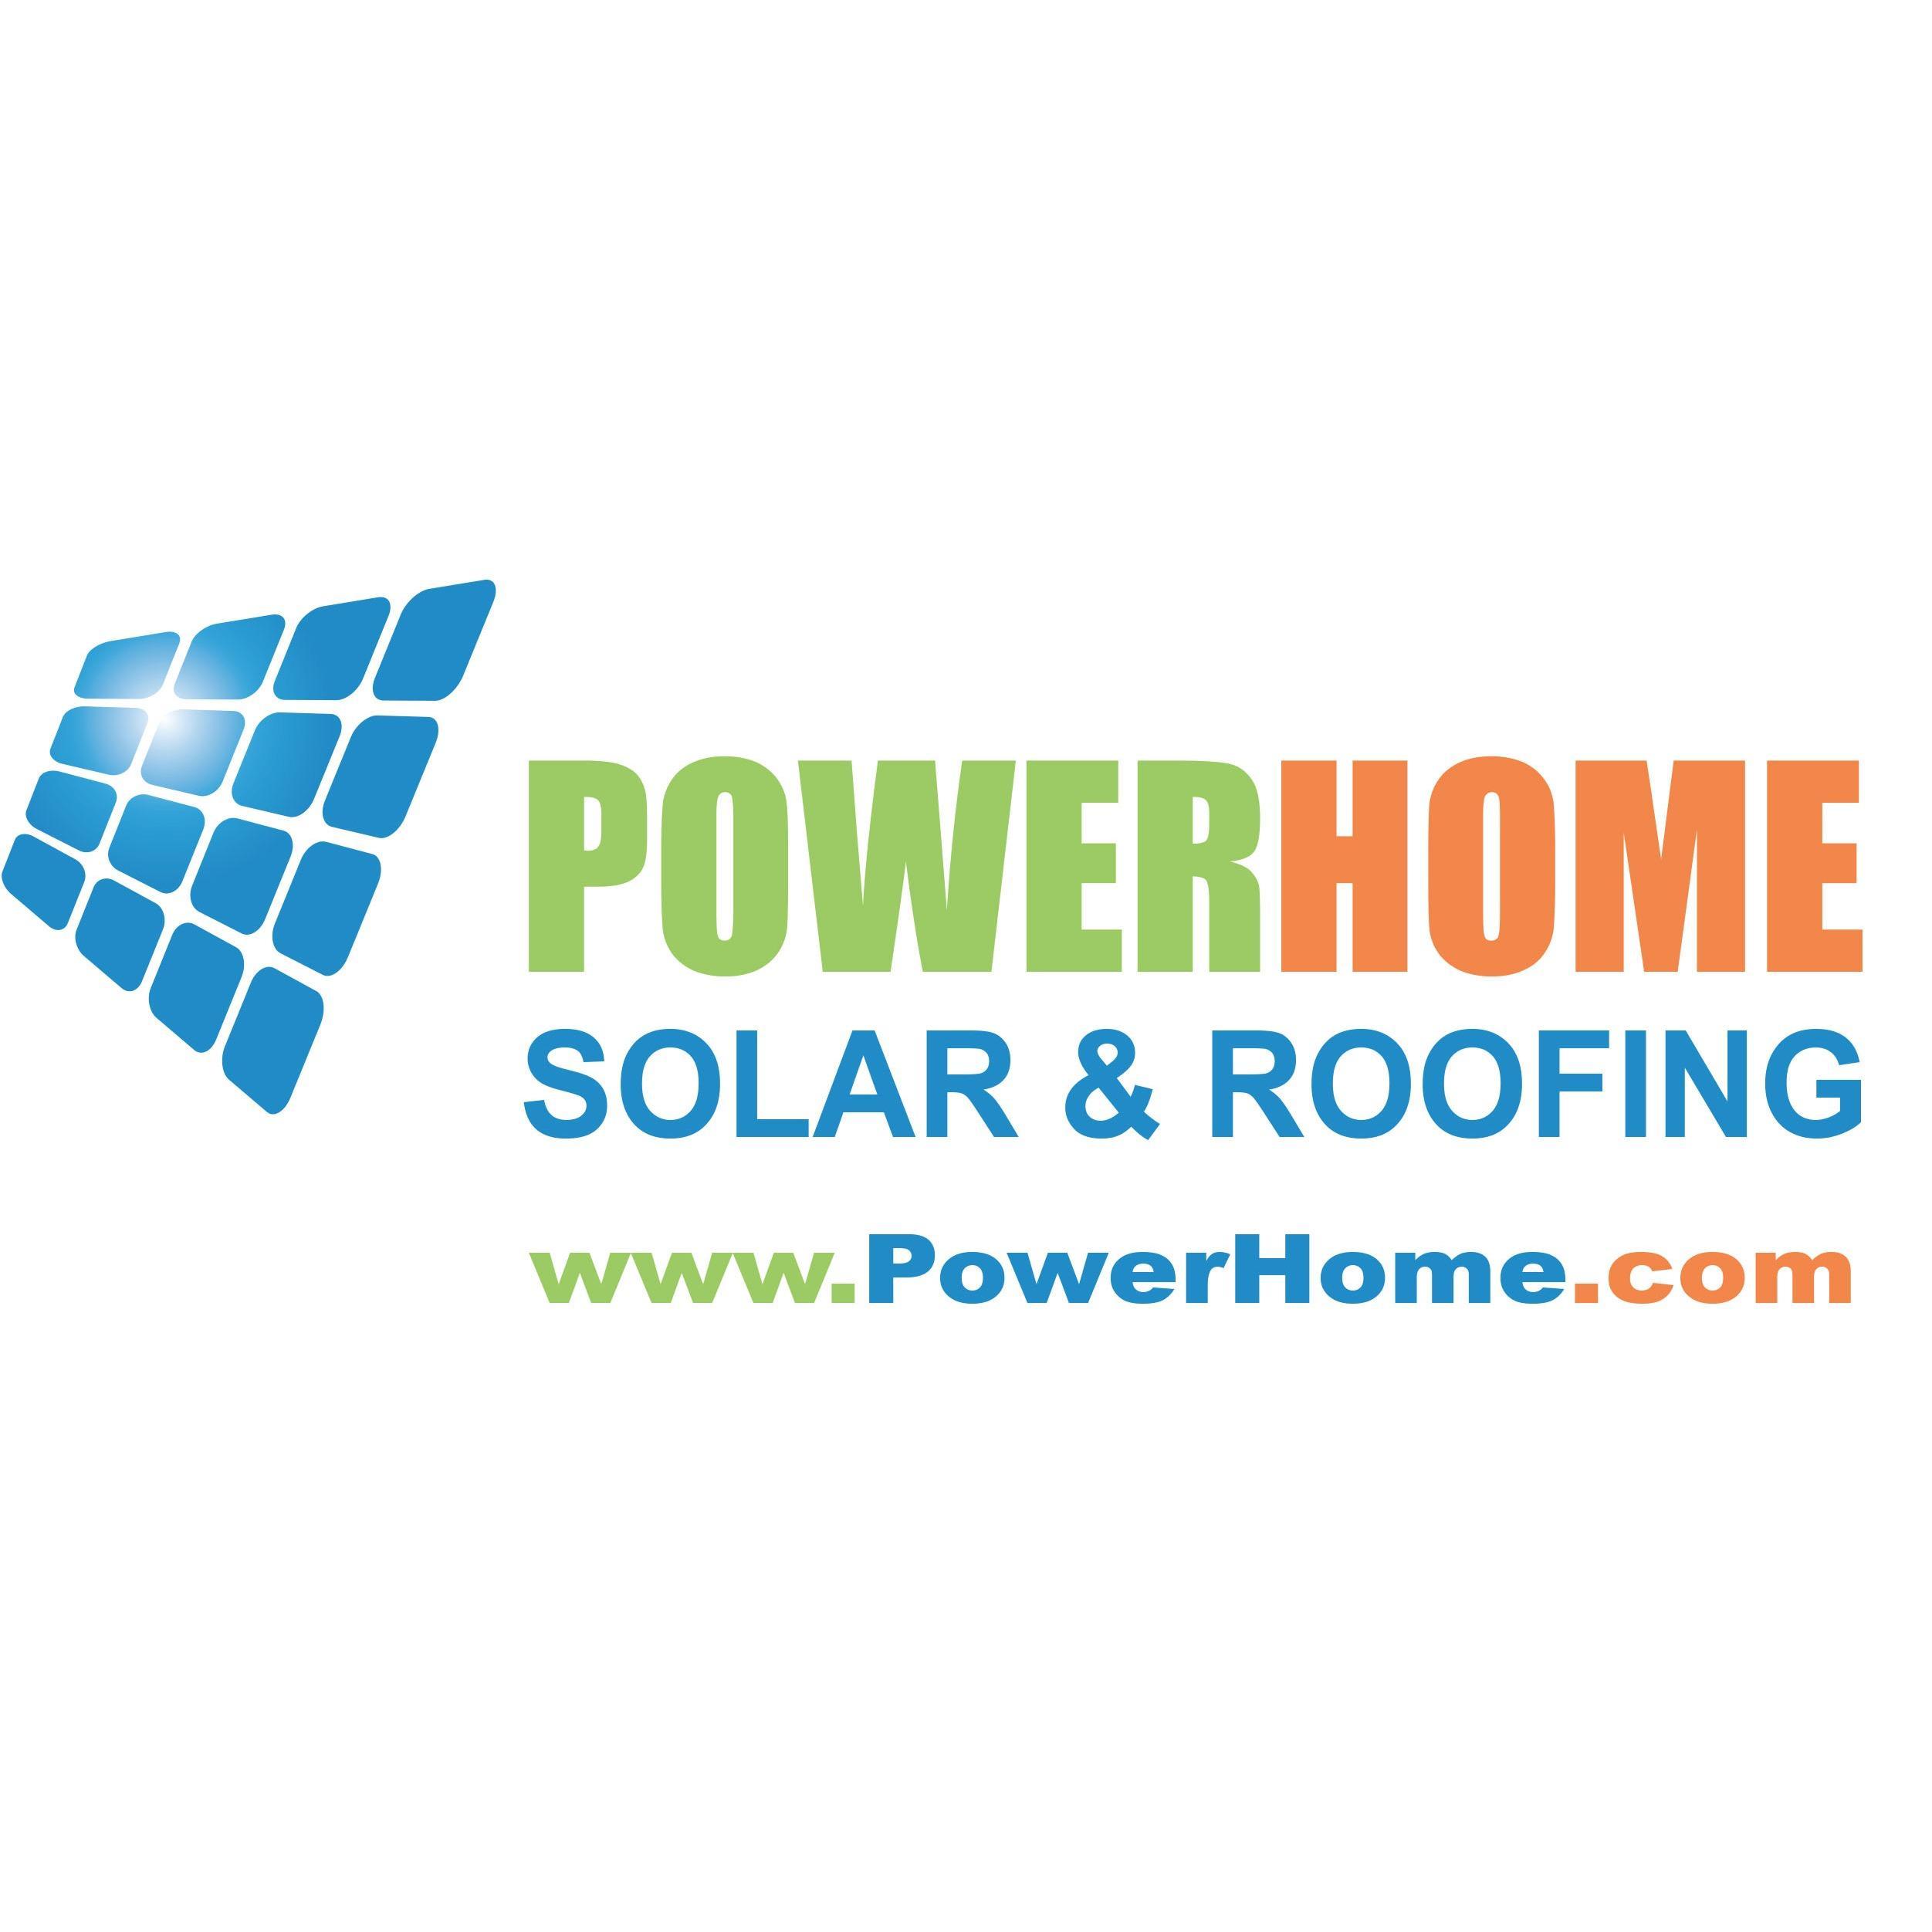 Powerhome Solar